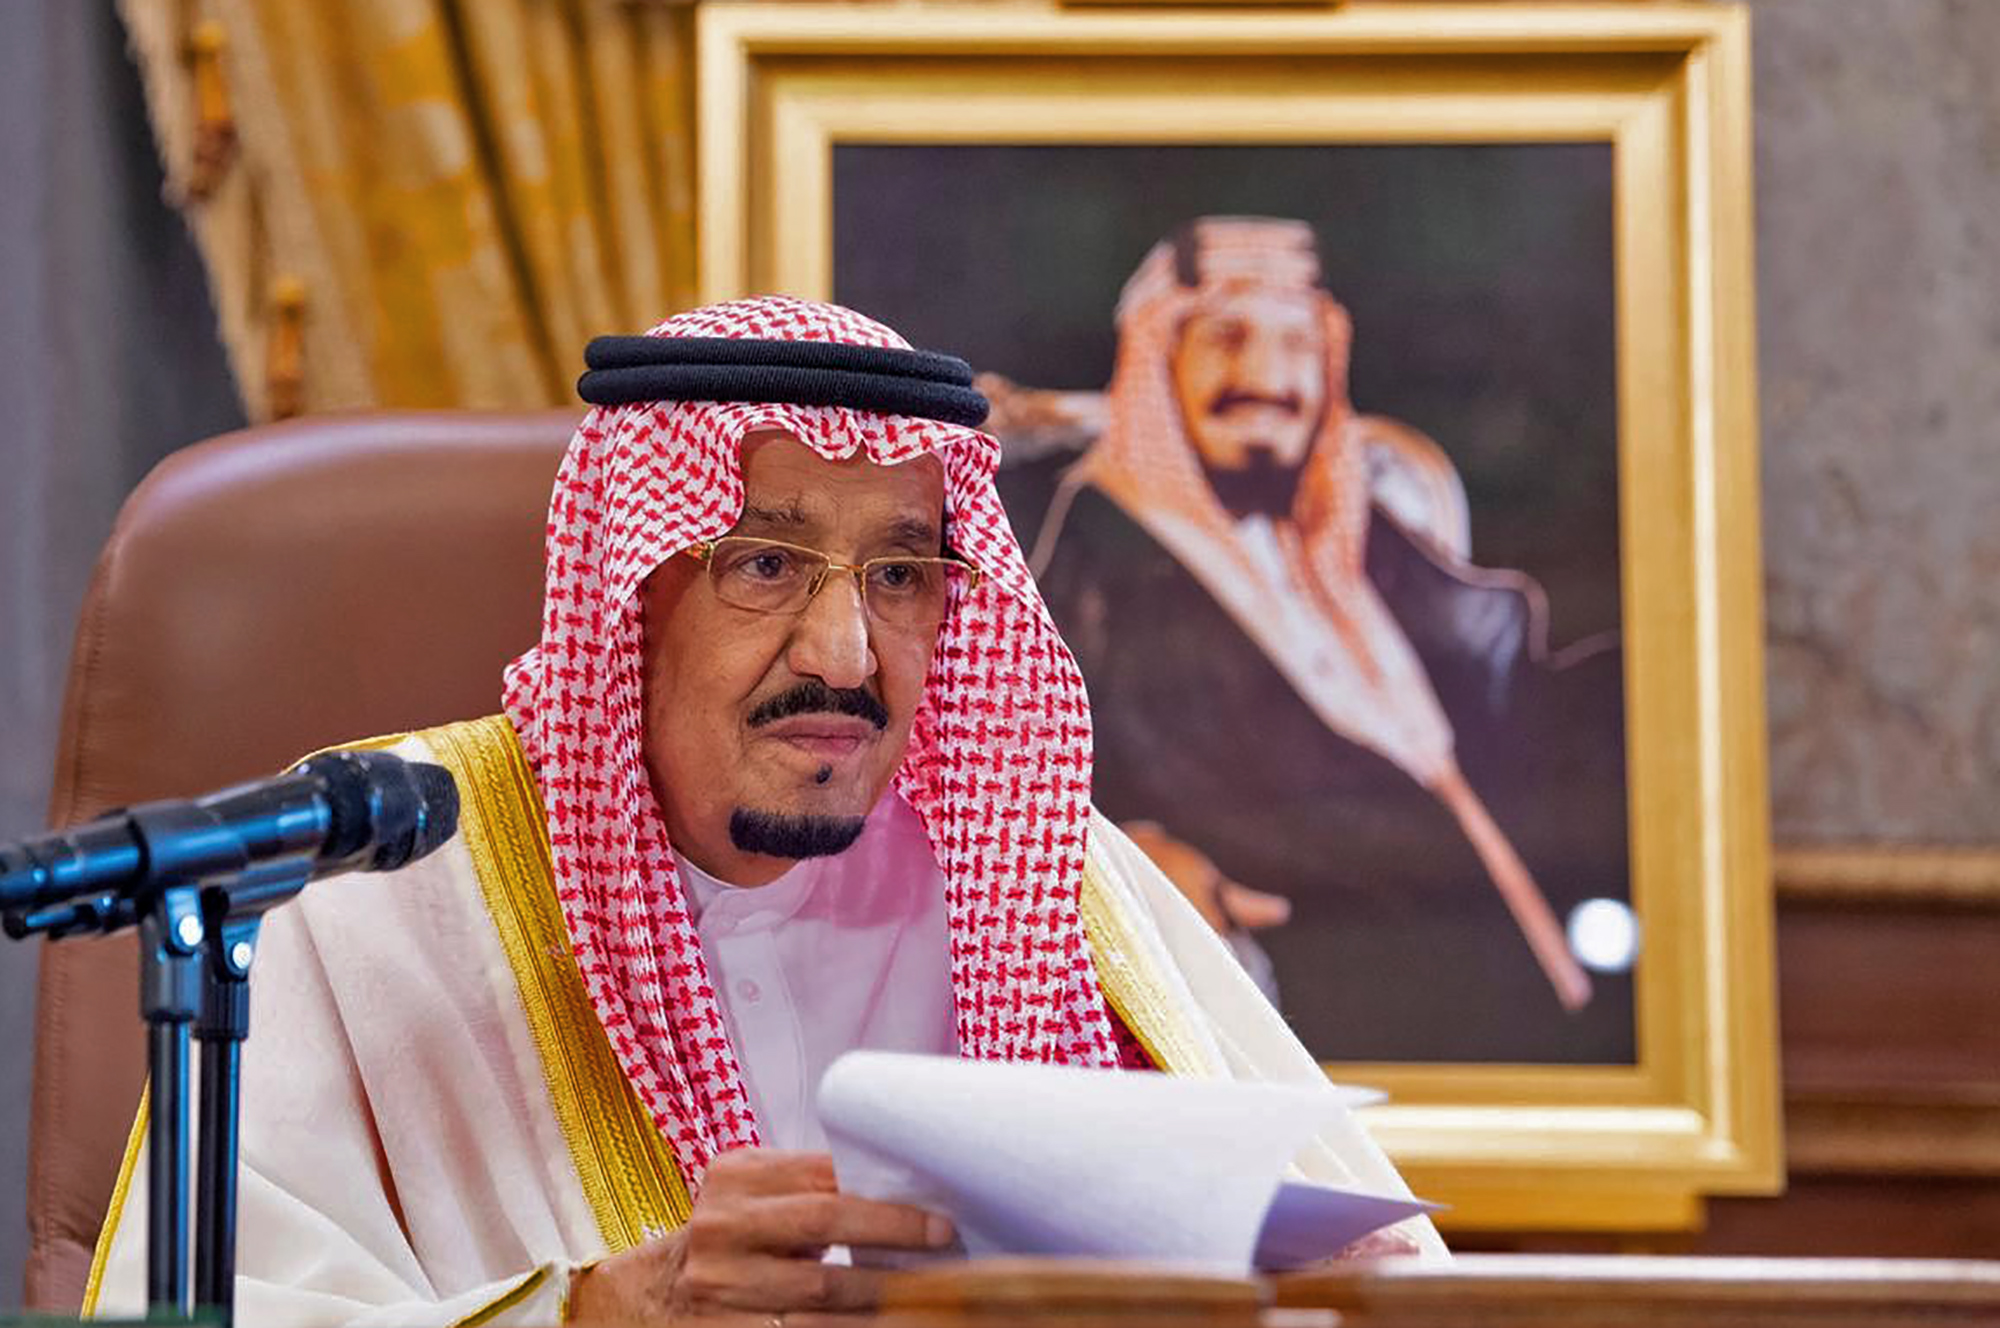 Coronavirus: Saudi king grants $2.4bn to private-sector employees